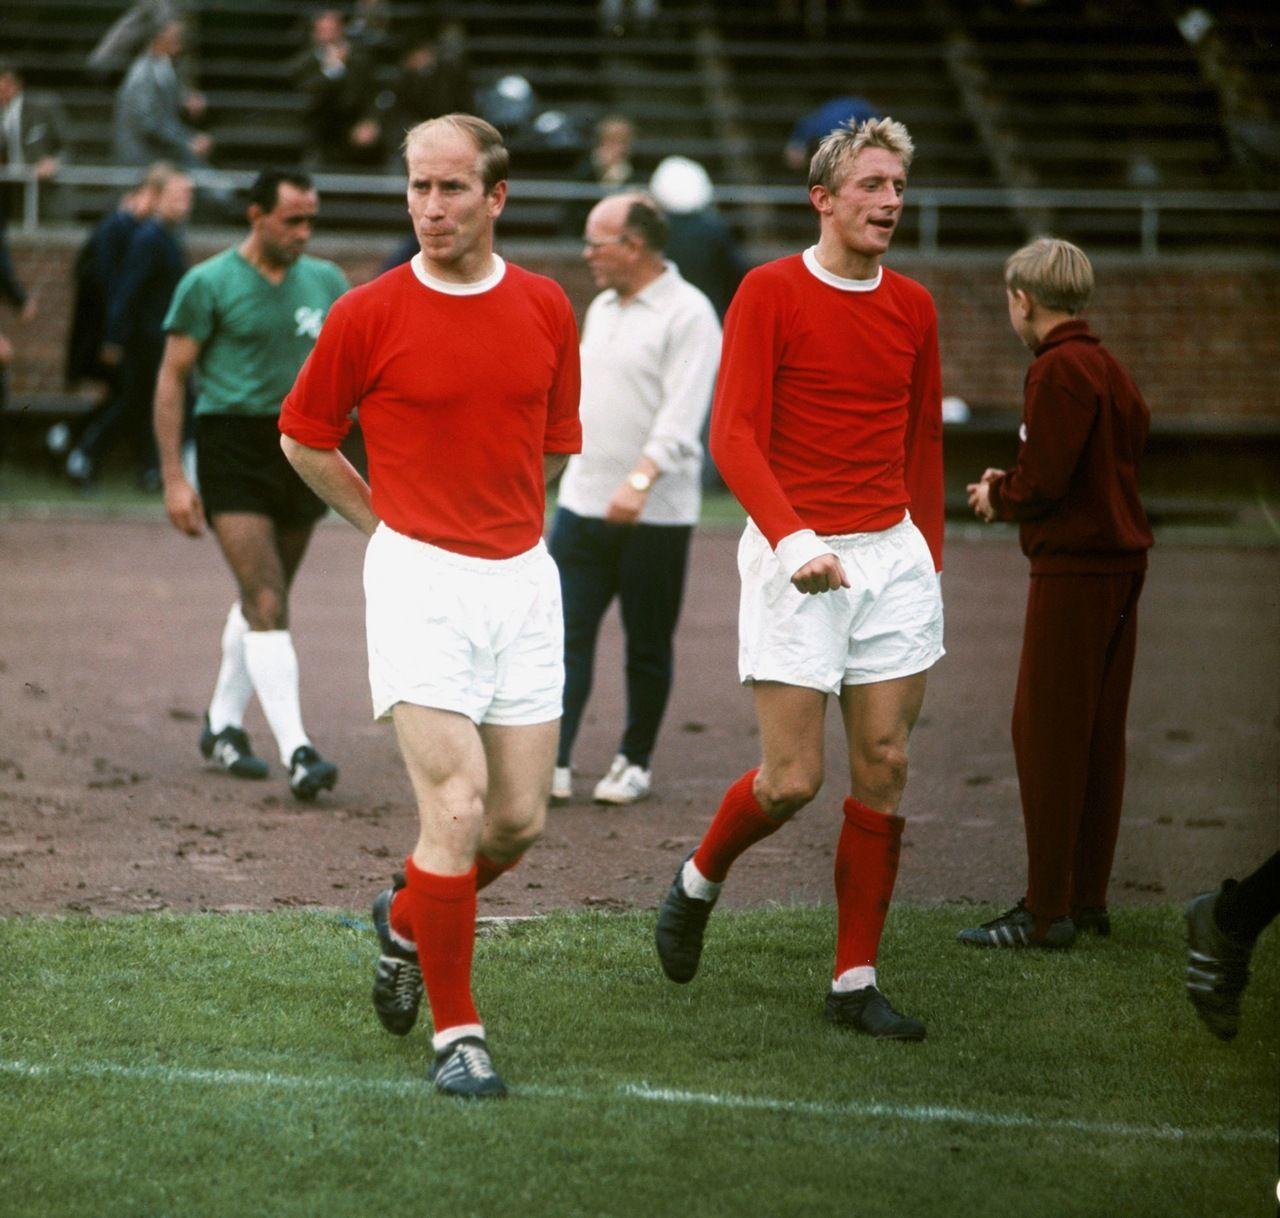 Dennis Law & Bobby Charlton